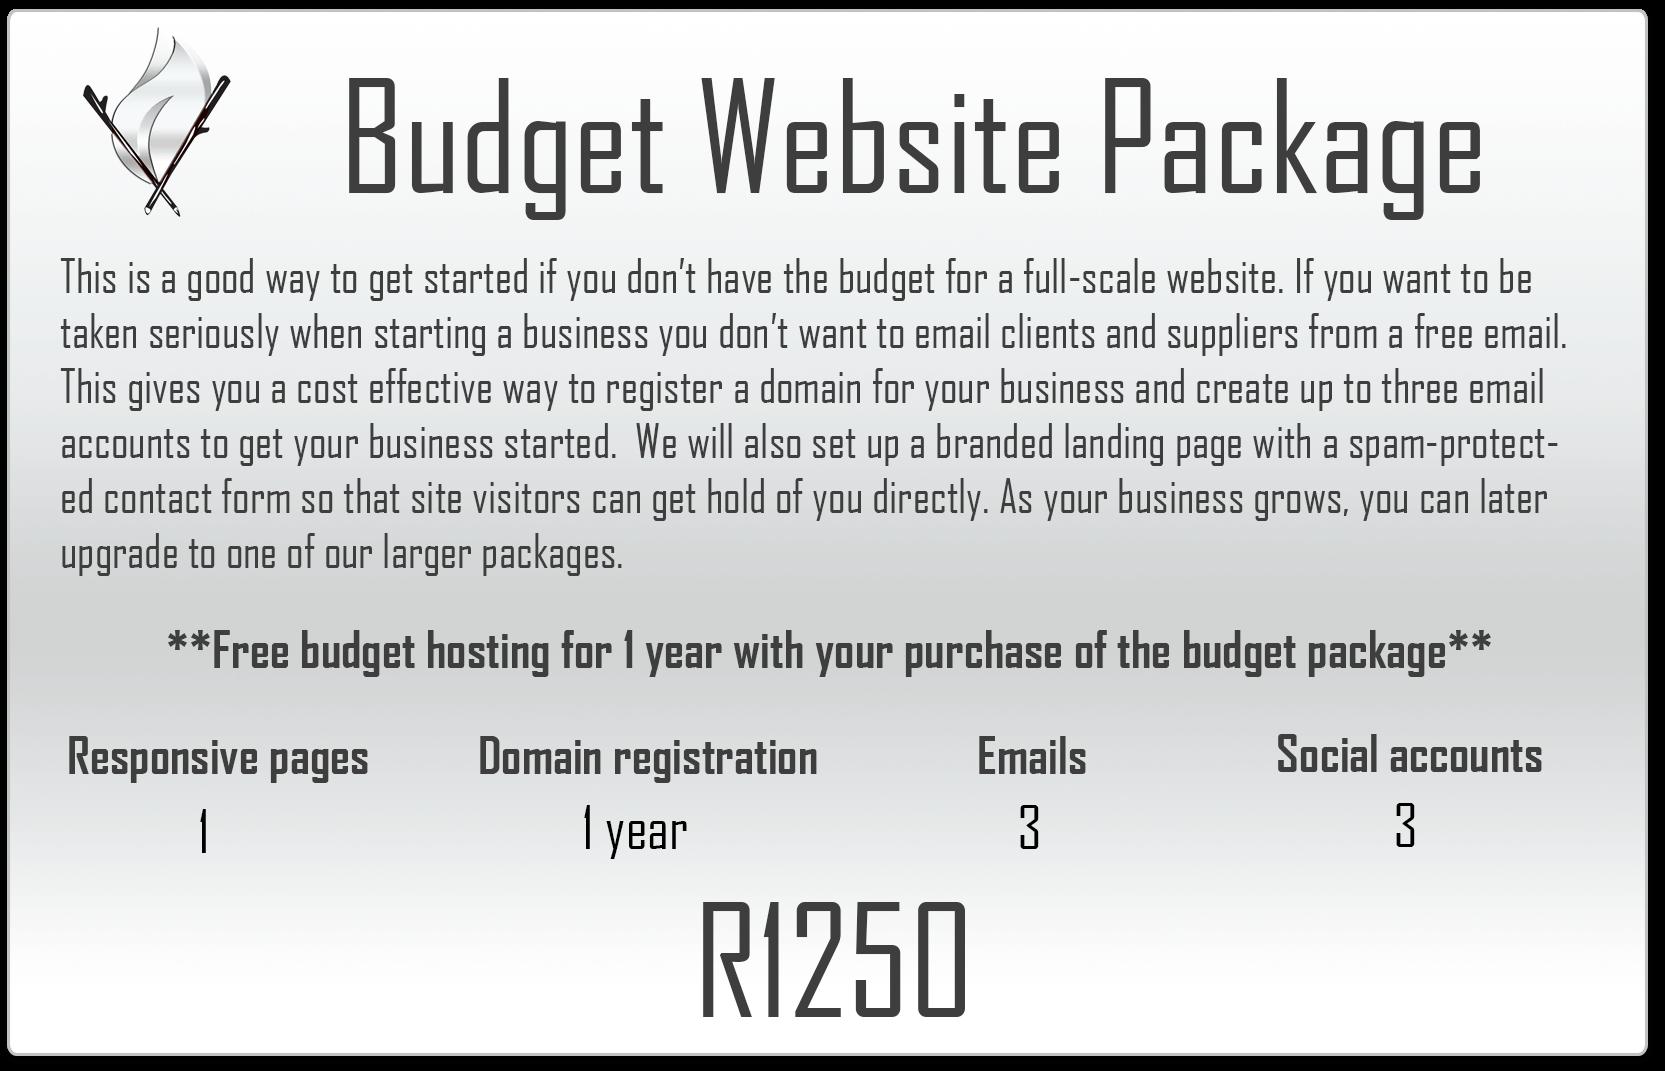 Budget website package - Veldfire Digital